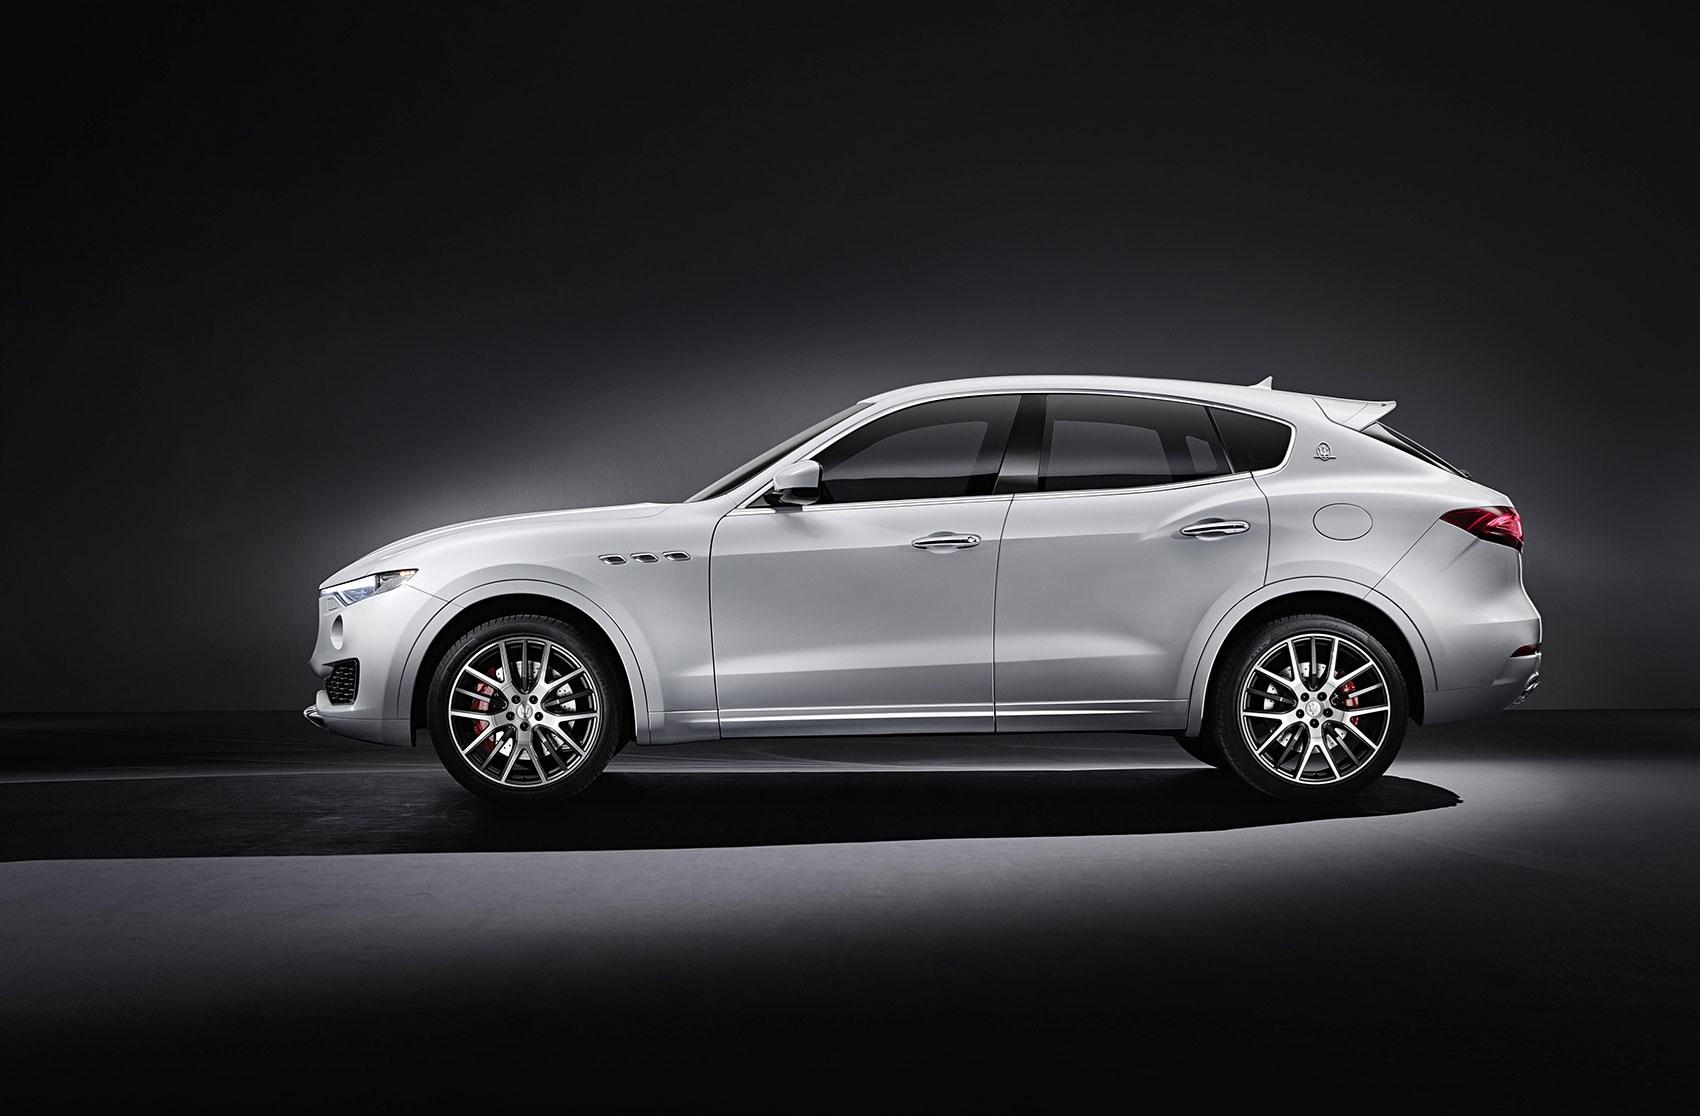 maserati levante priced from £54,000 in uk | car magazine